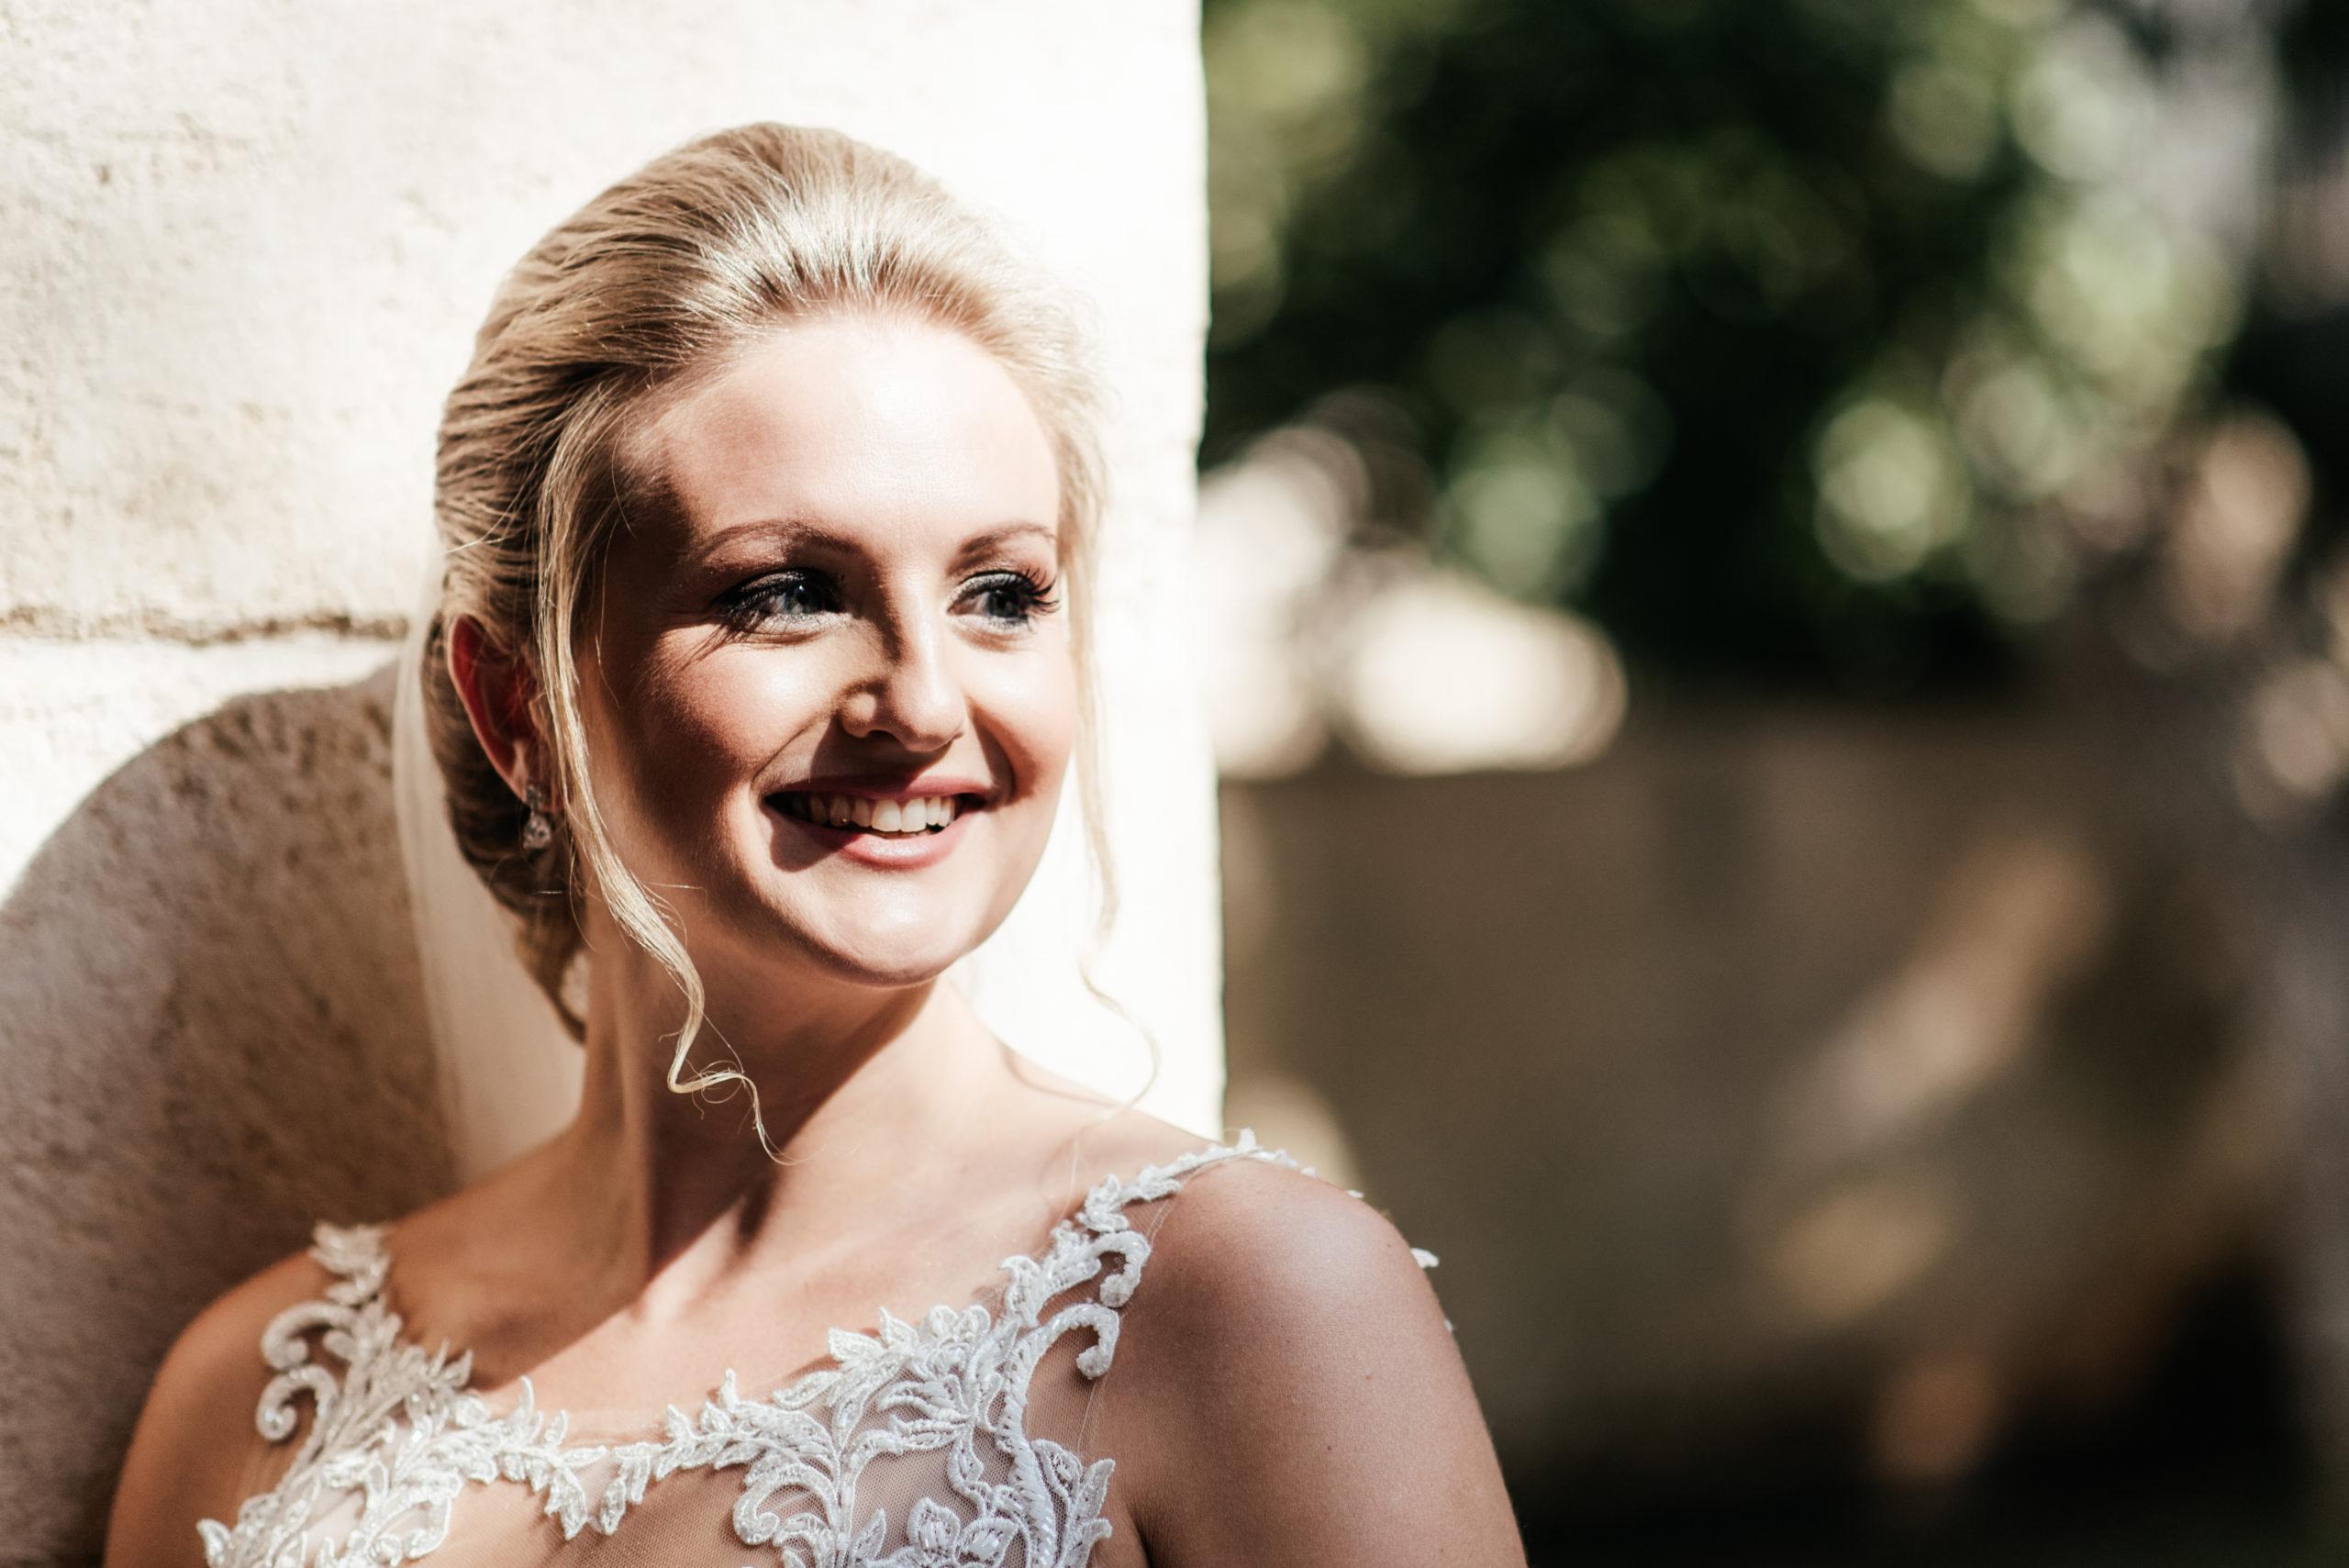 Amanda, the bride